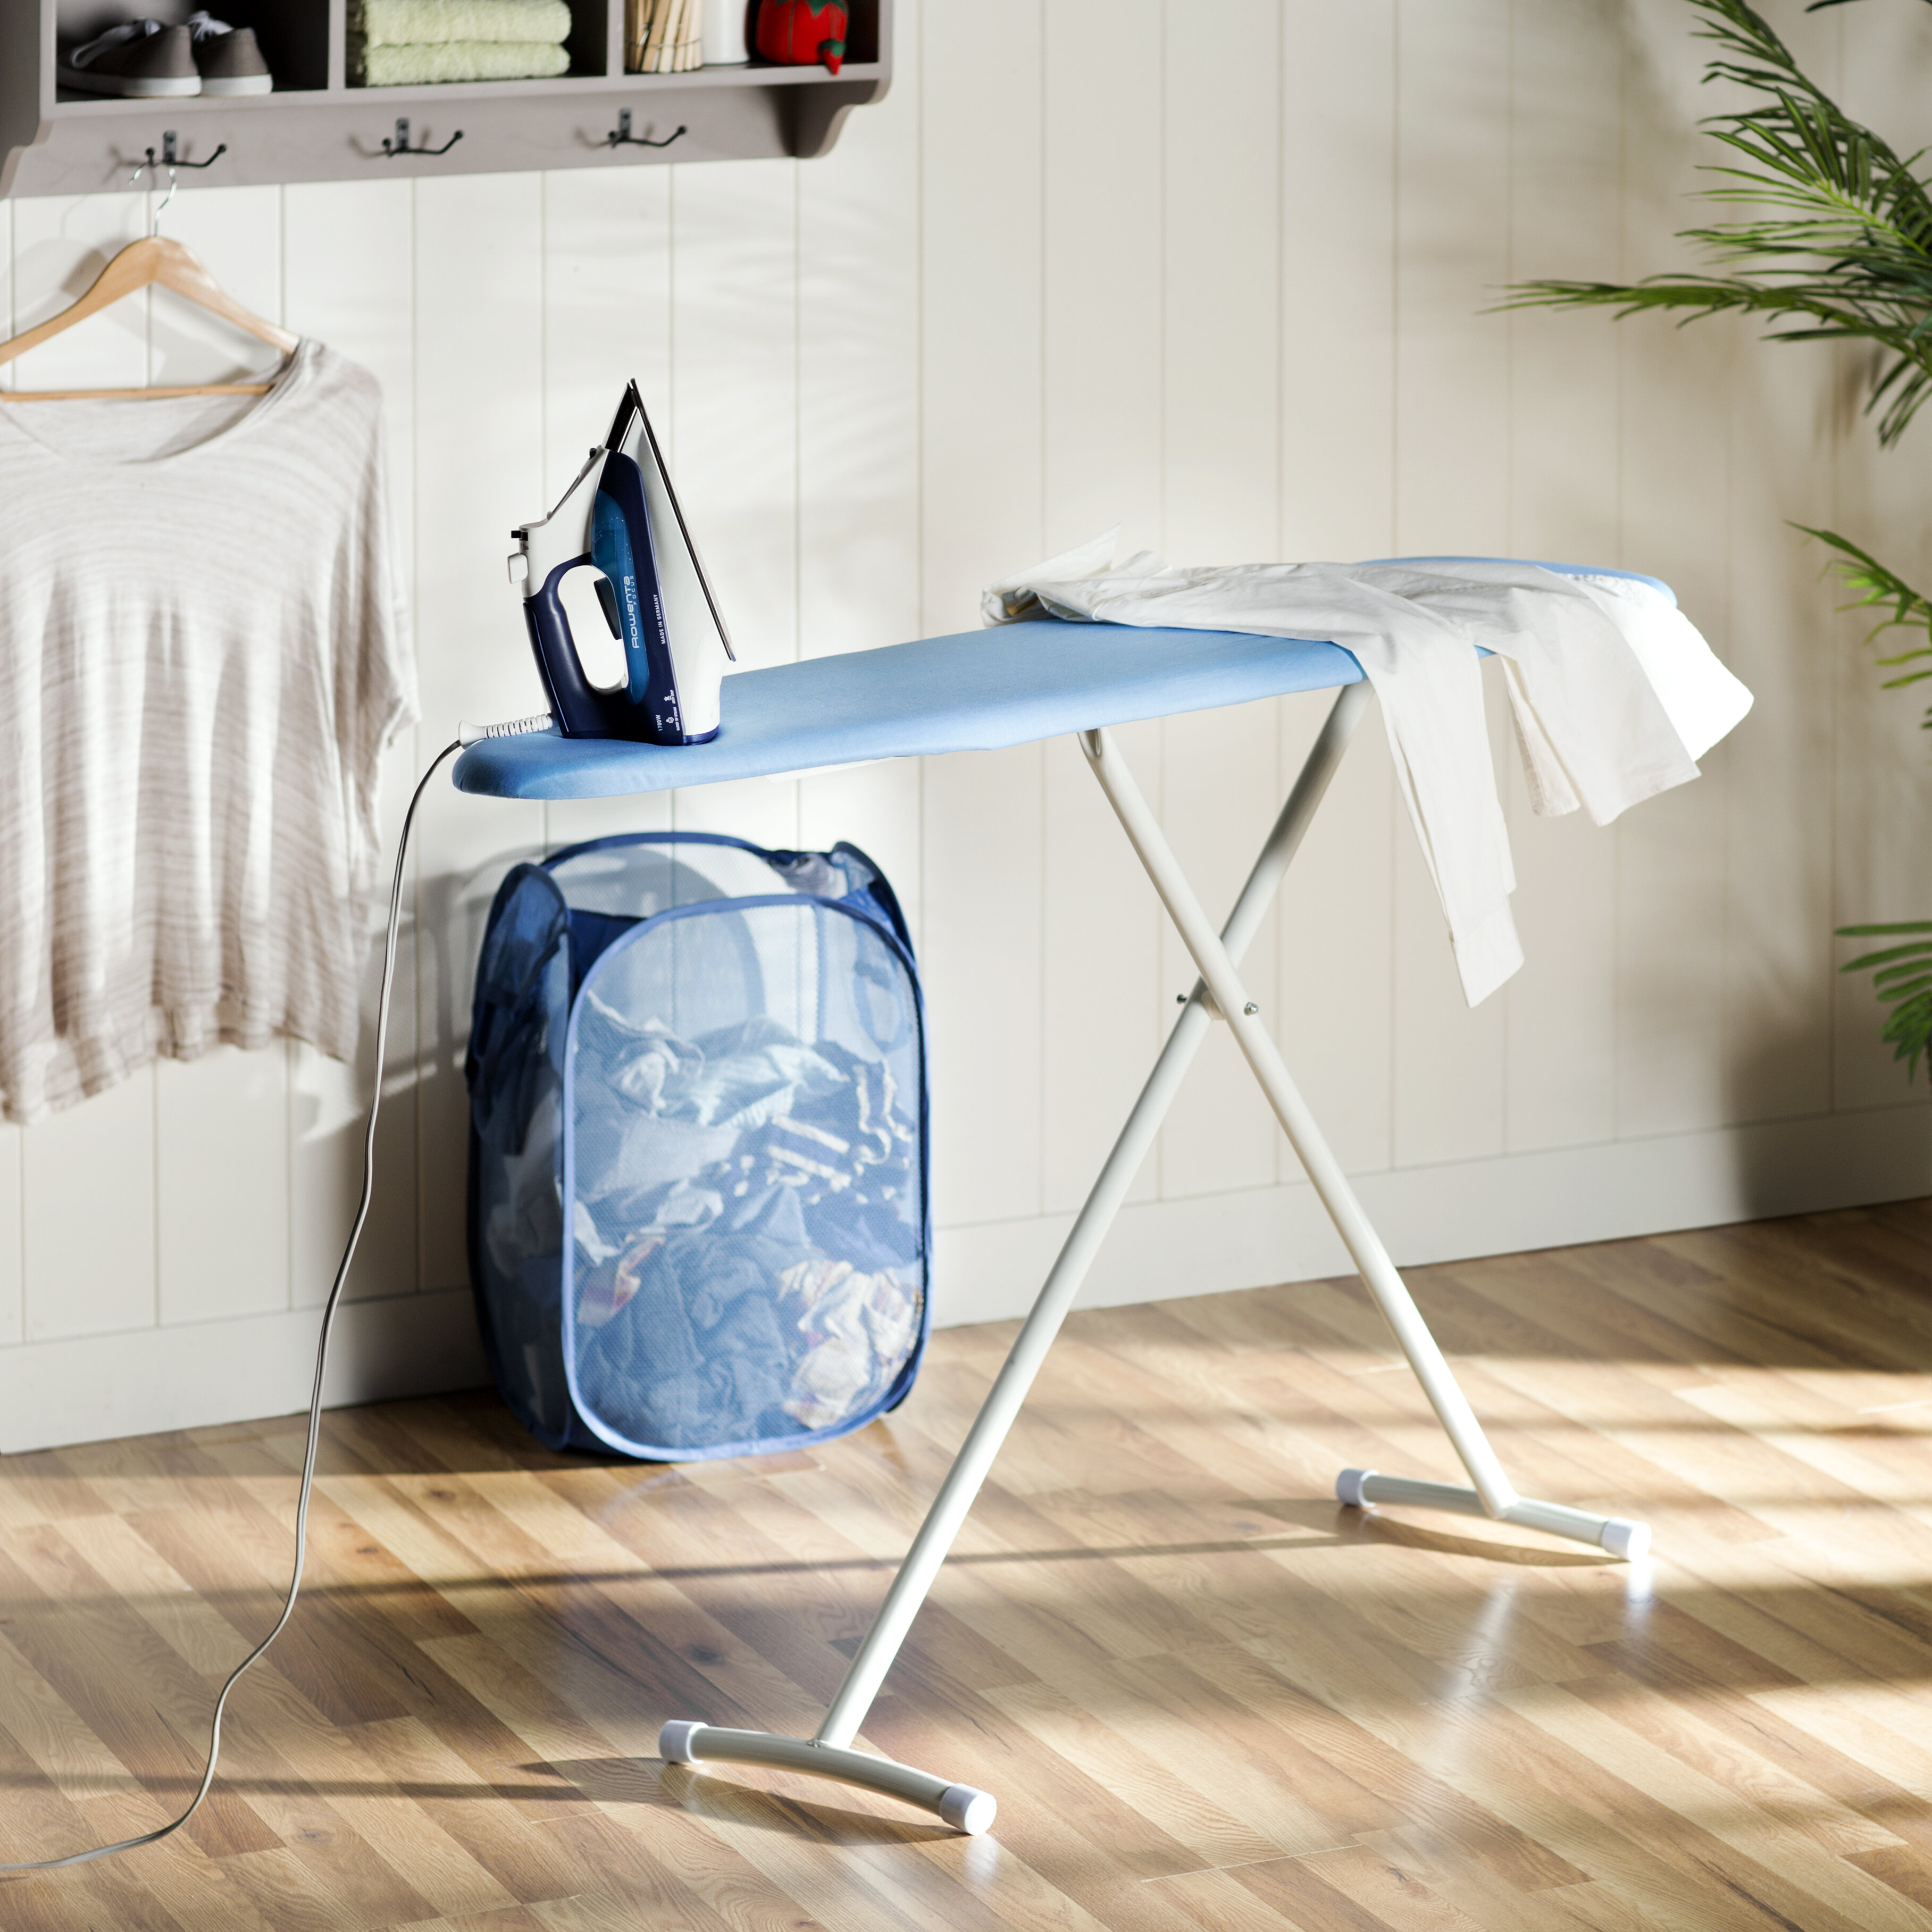 ironing board furniture. Wayfair Basics™ Basics 3 Piece Ironing Board And Pop Open Hamper Set \u0026 Reviews | Wayfair.ca Furniture